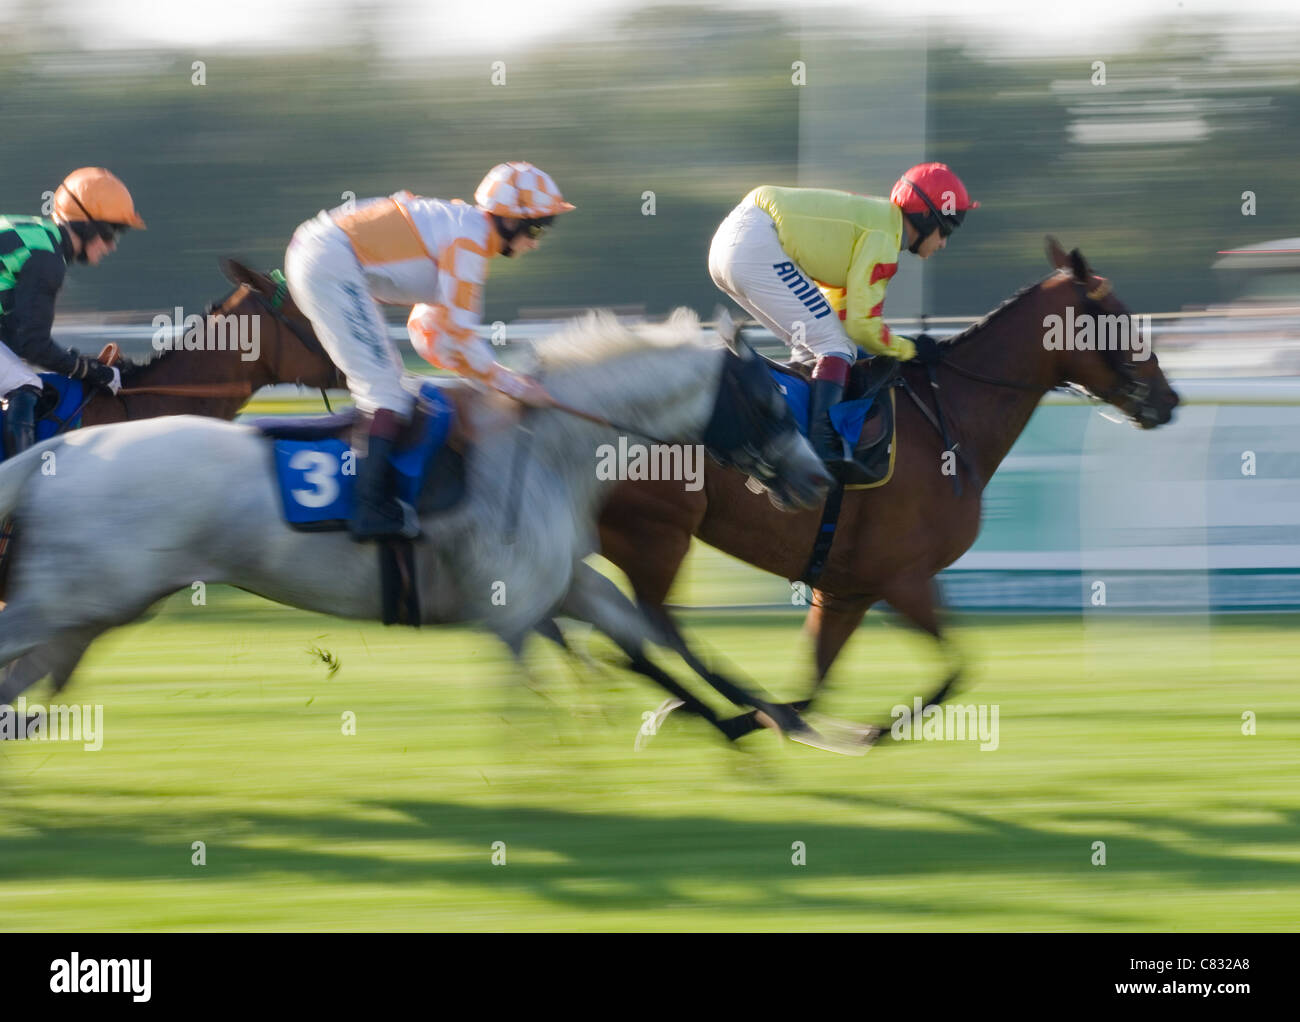 Grupo de Carreras de Caballos Carreras de caballos UK Imagen De Stock